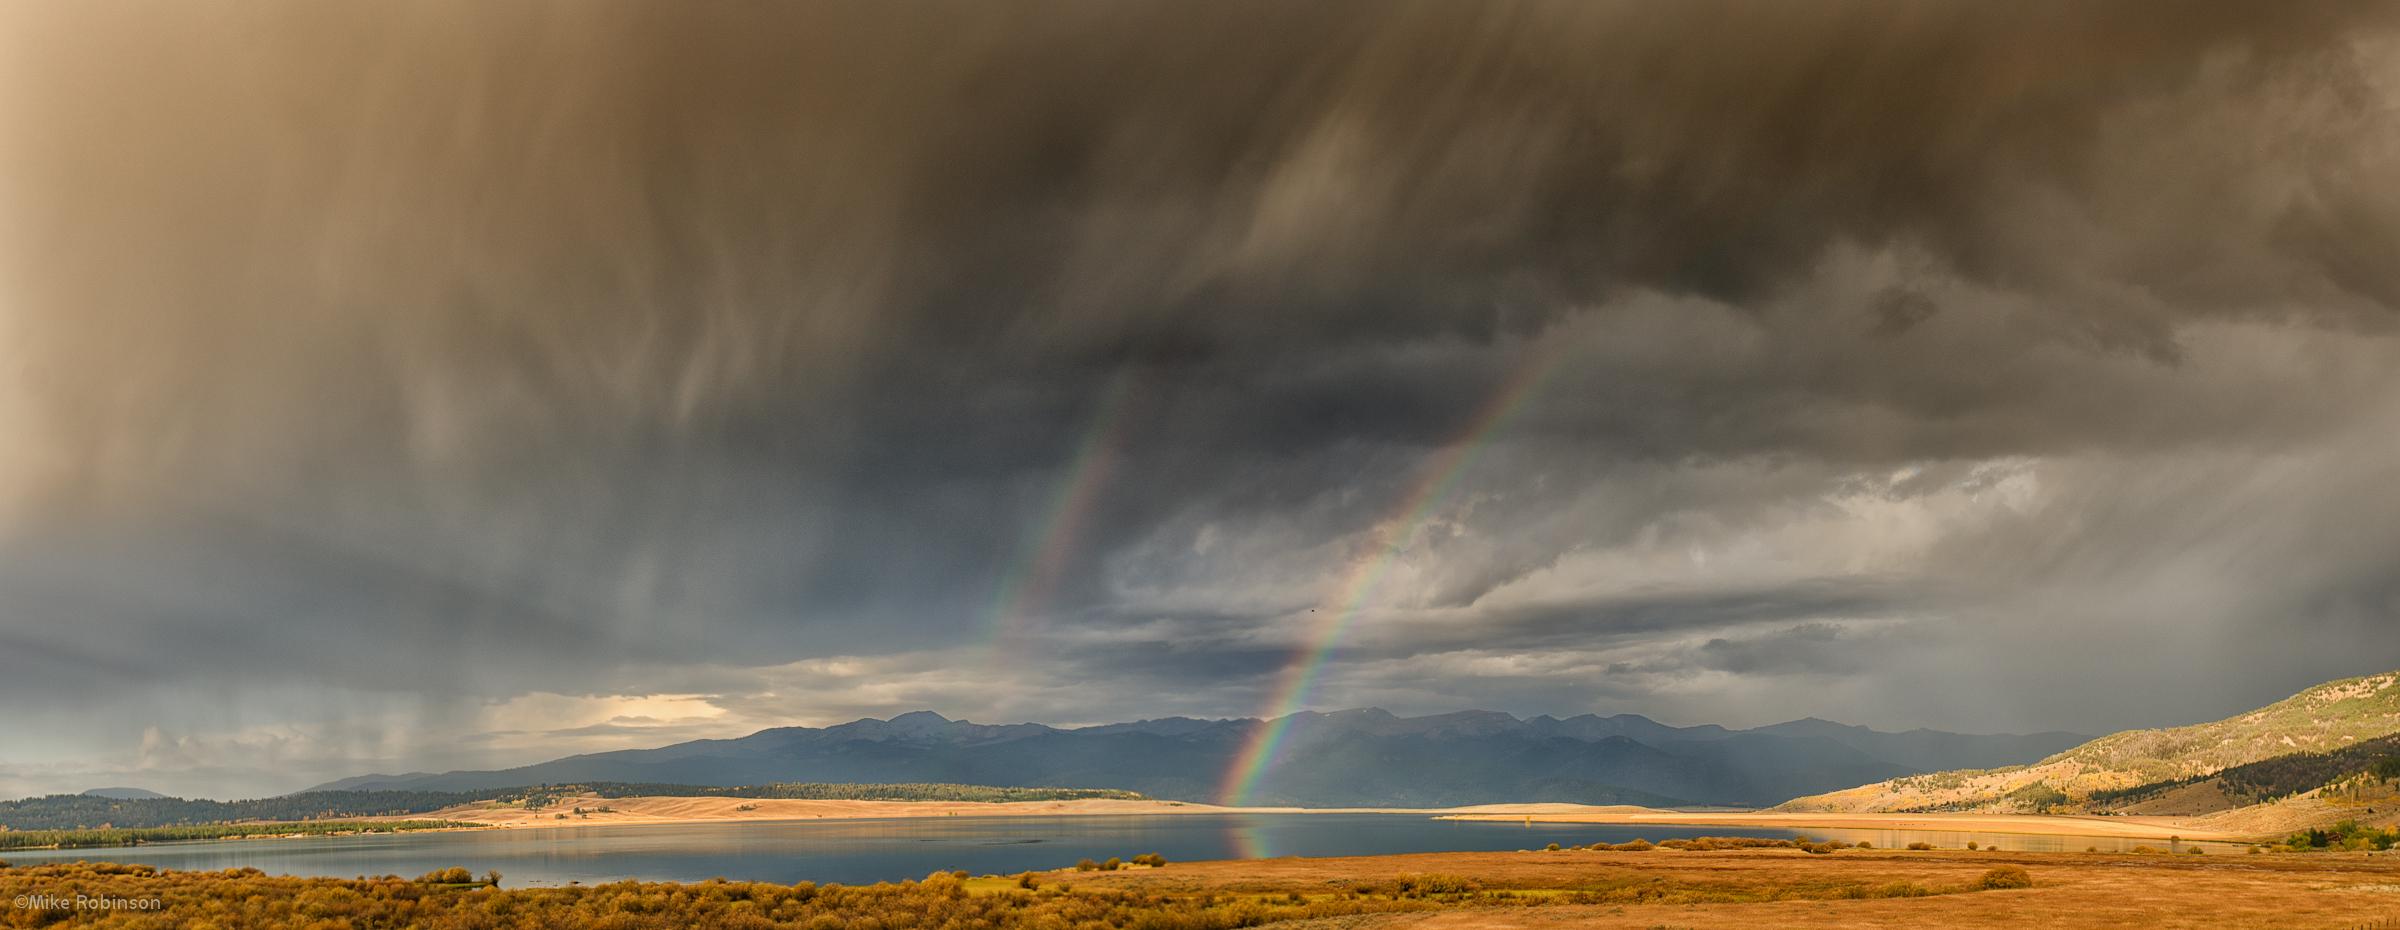 Hebgen Lake Double Rainbow.jpg